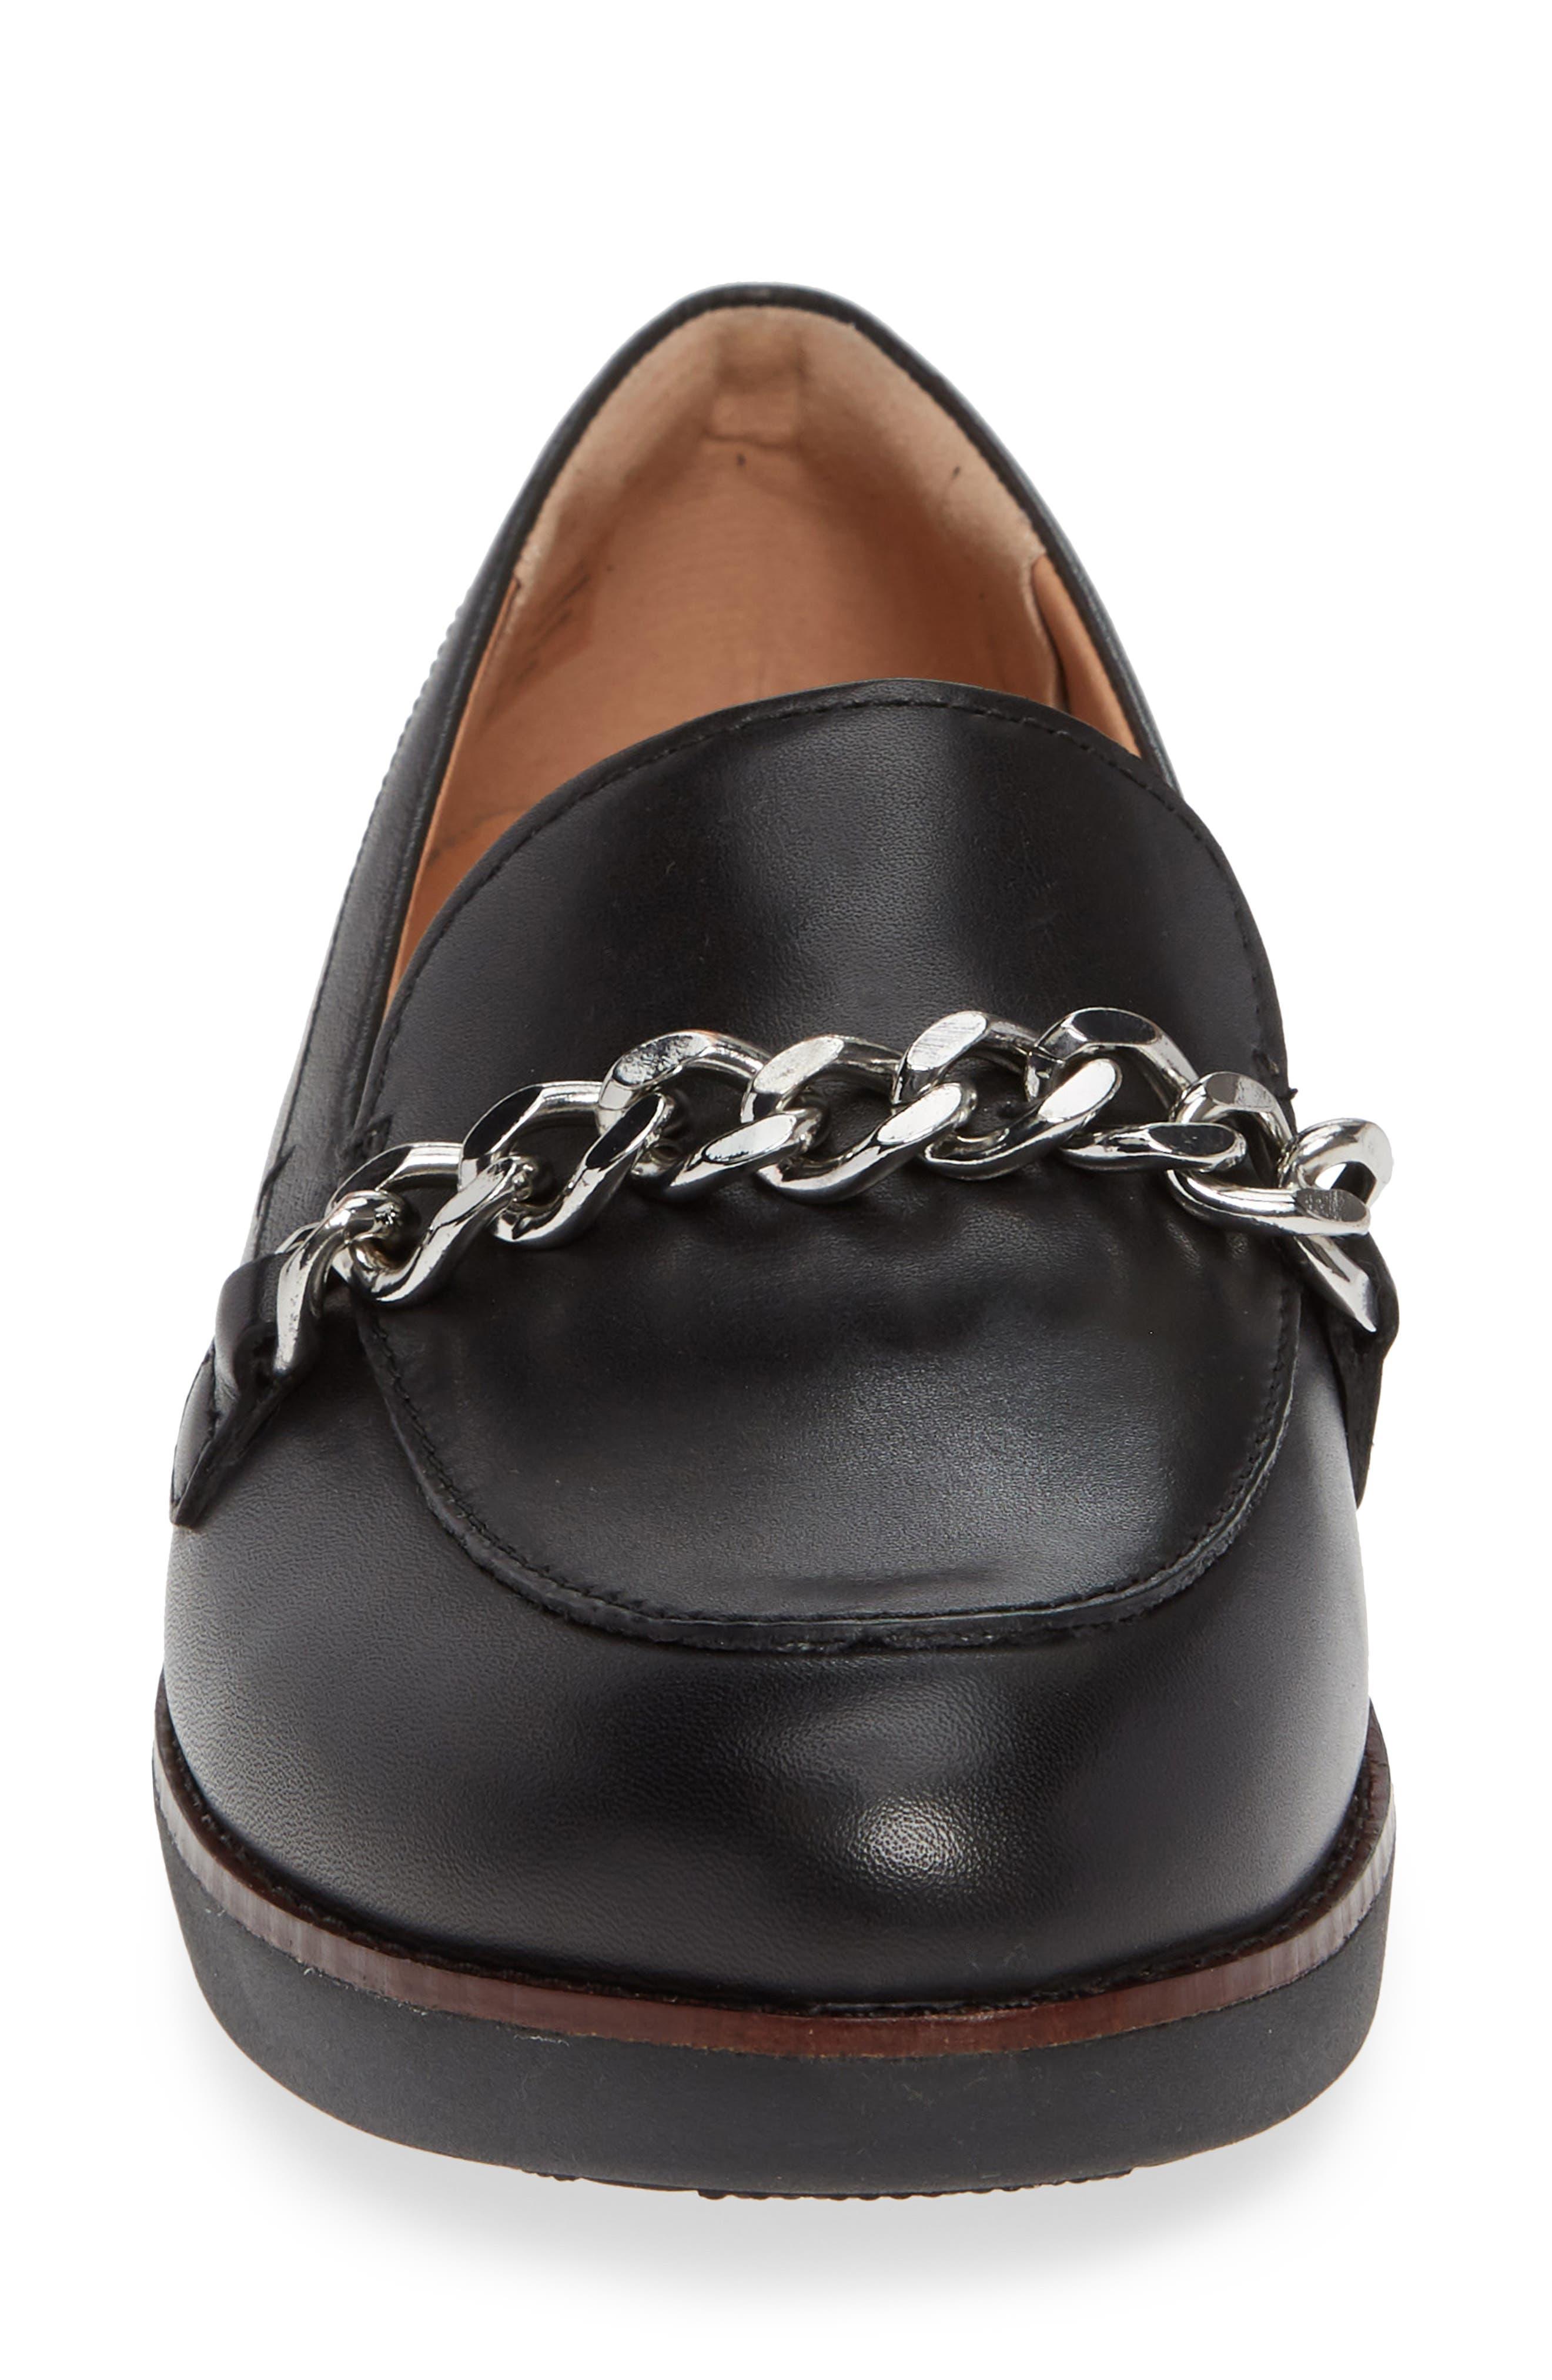 Petrina Chain Loafer,                             Alternate thumbnail 4, color,                             BLACK LEATHER